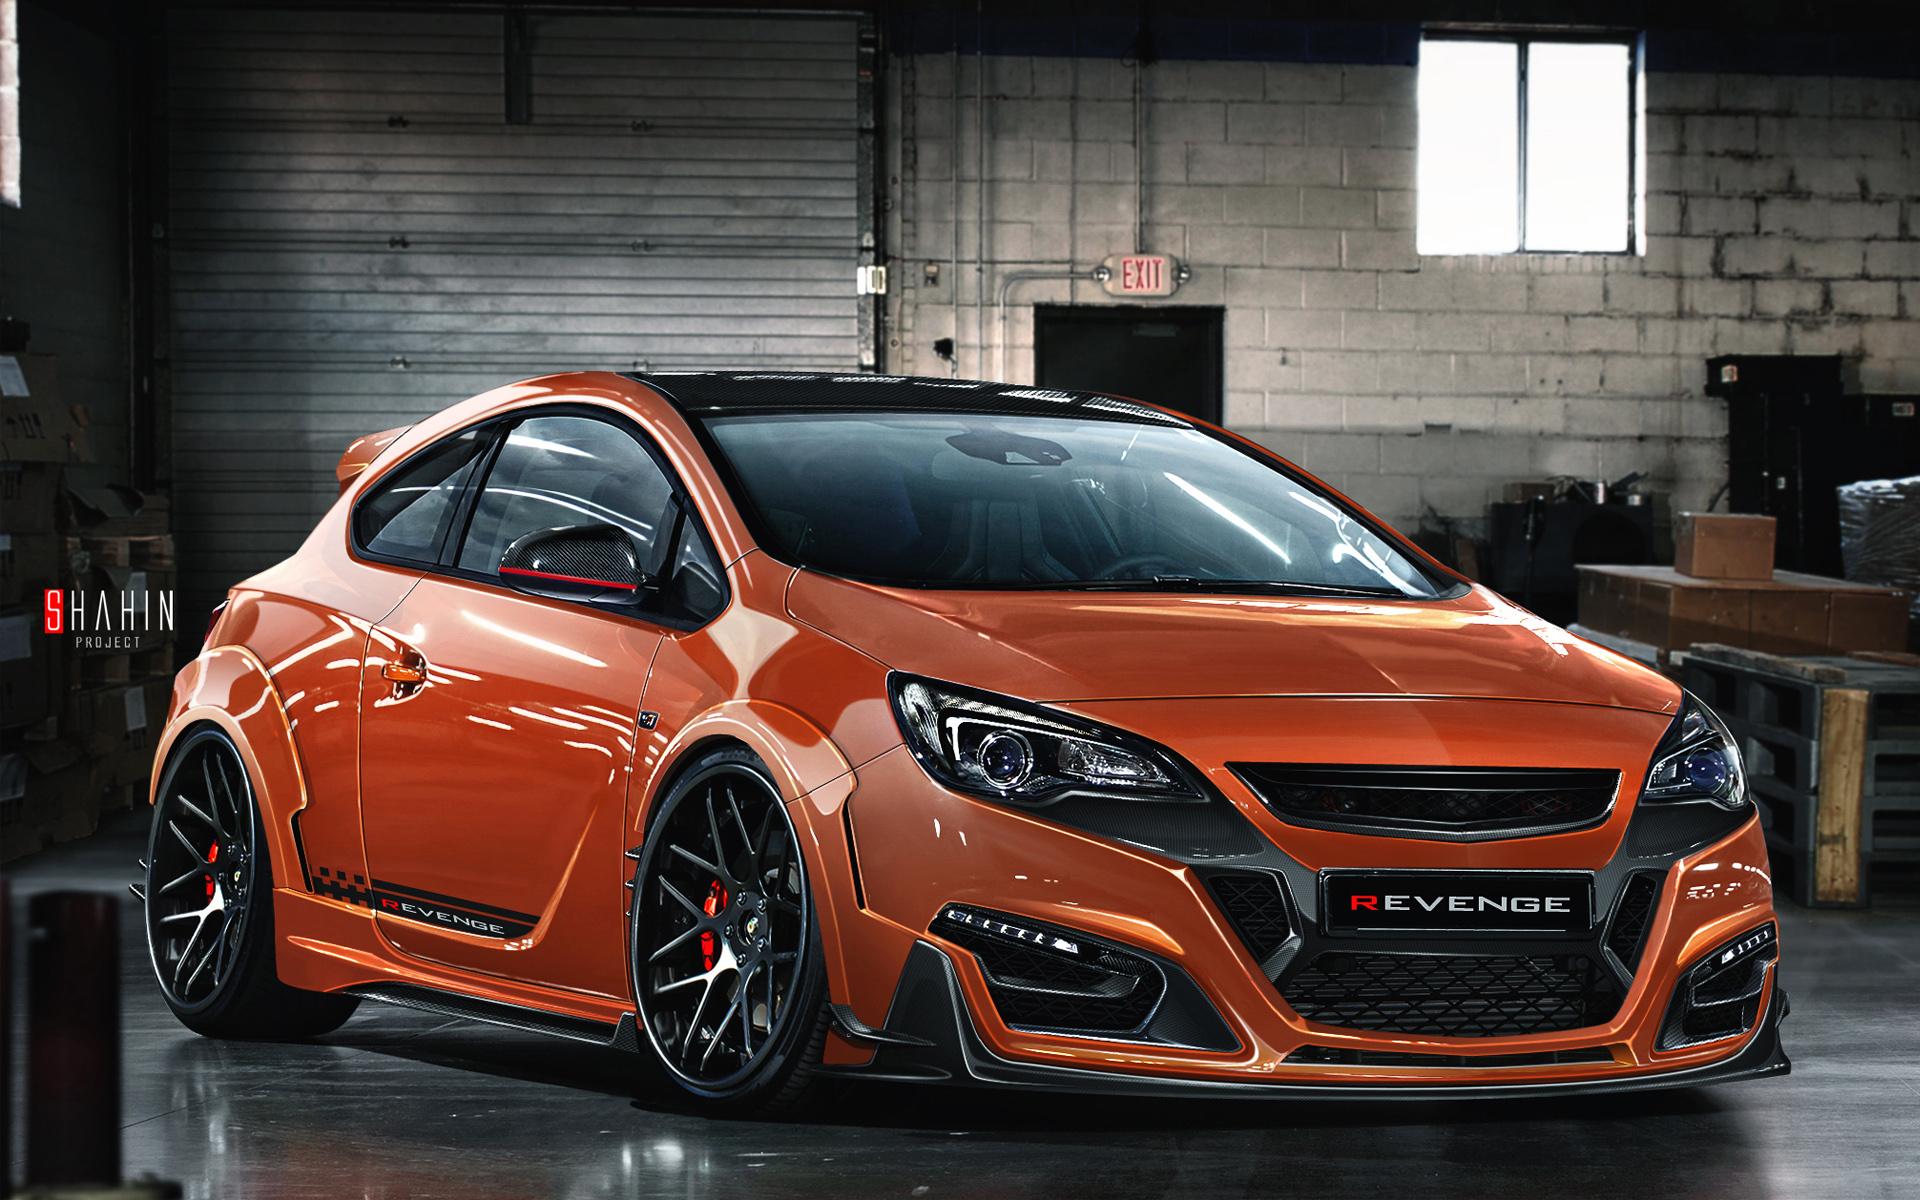 2015 Opel Astra Gtc Revenge Wallpaper  Hd Car Wallpapers